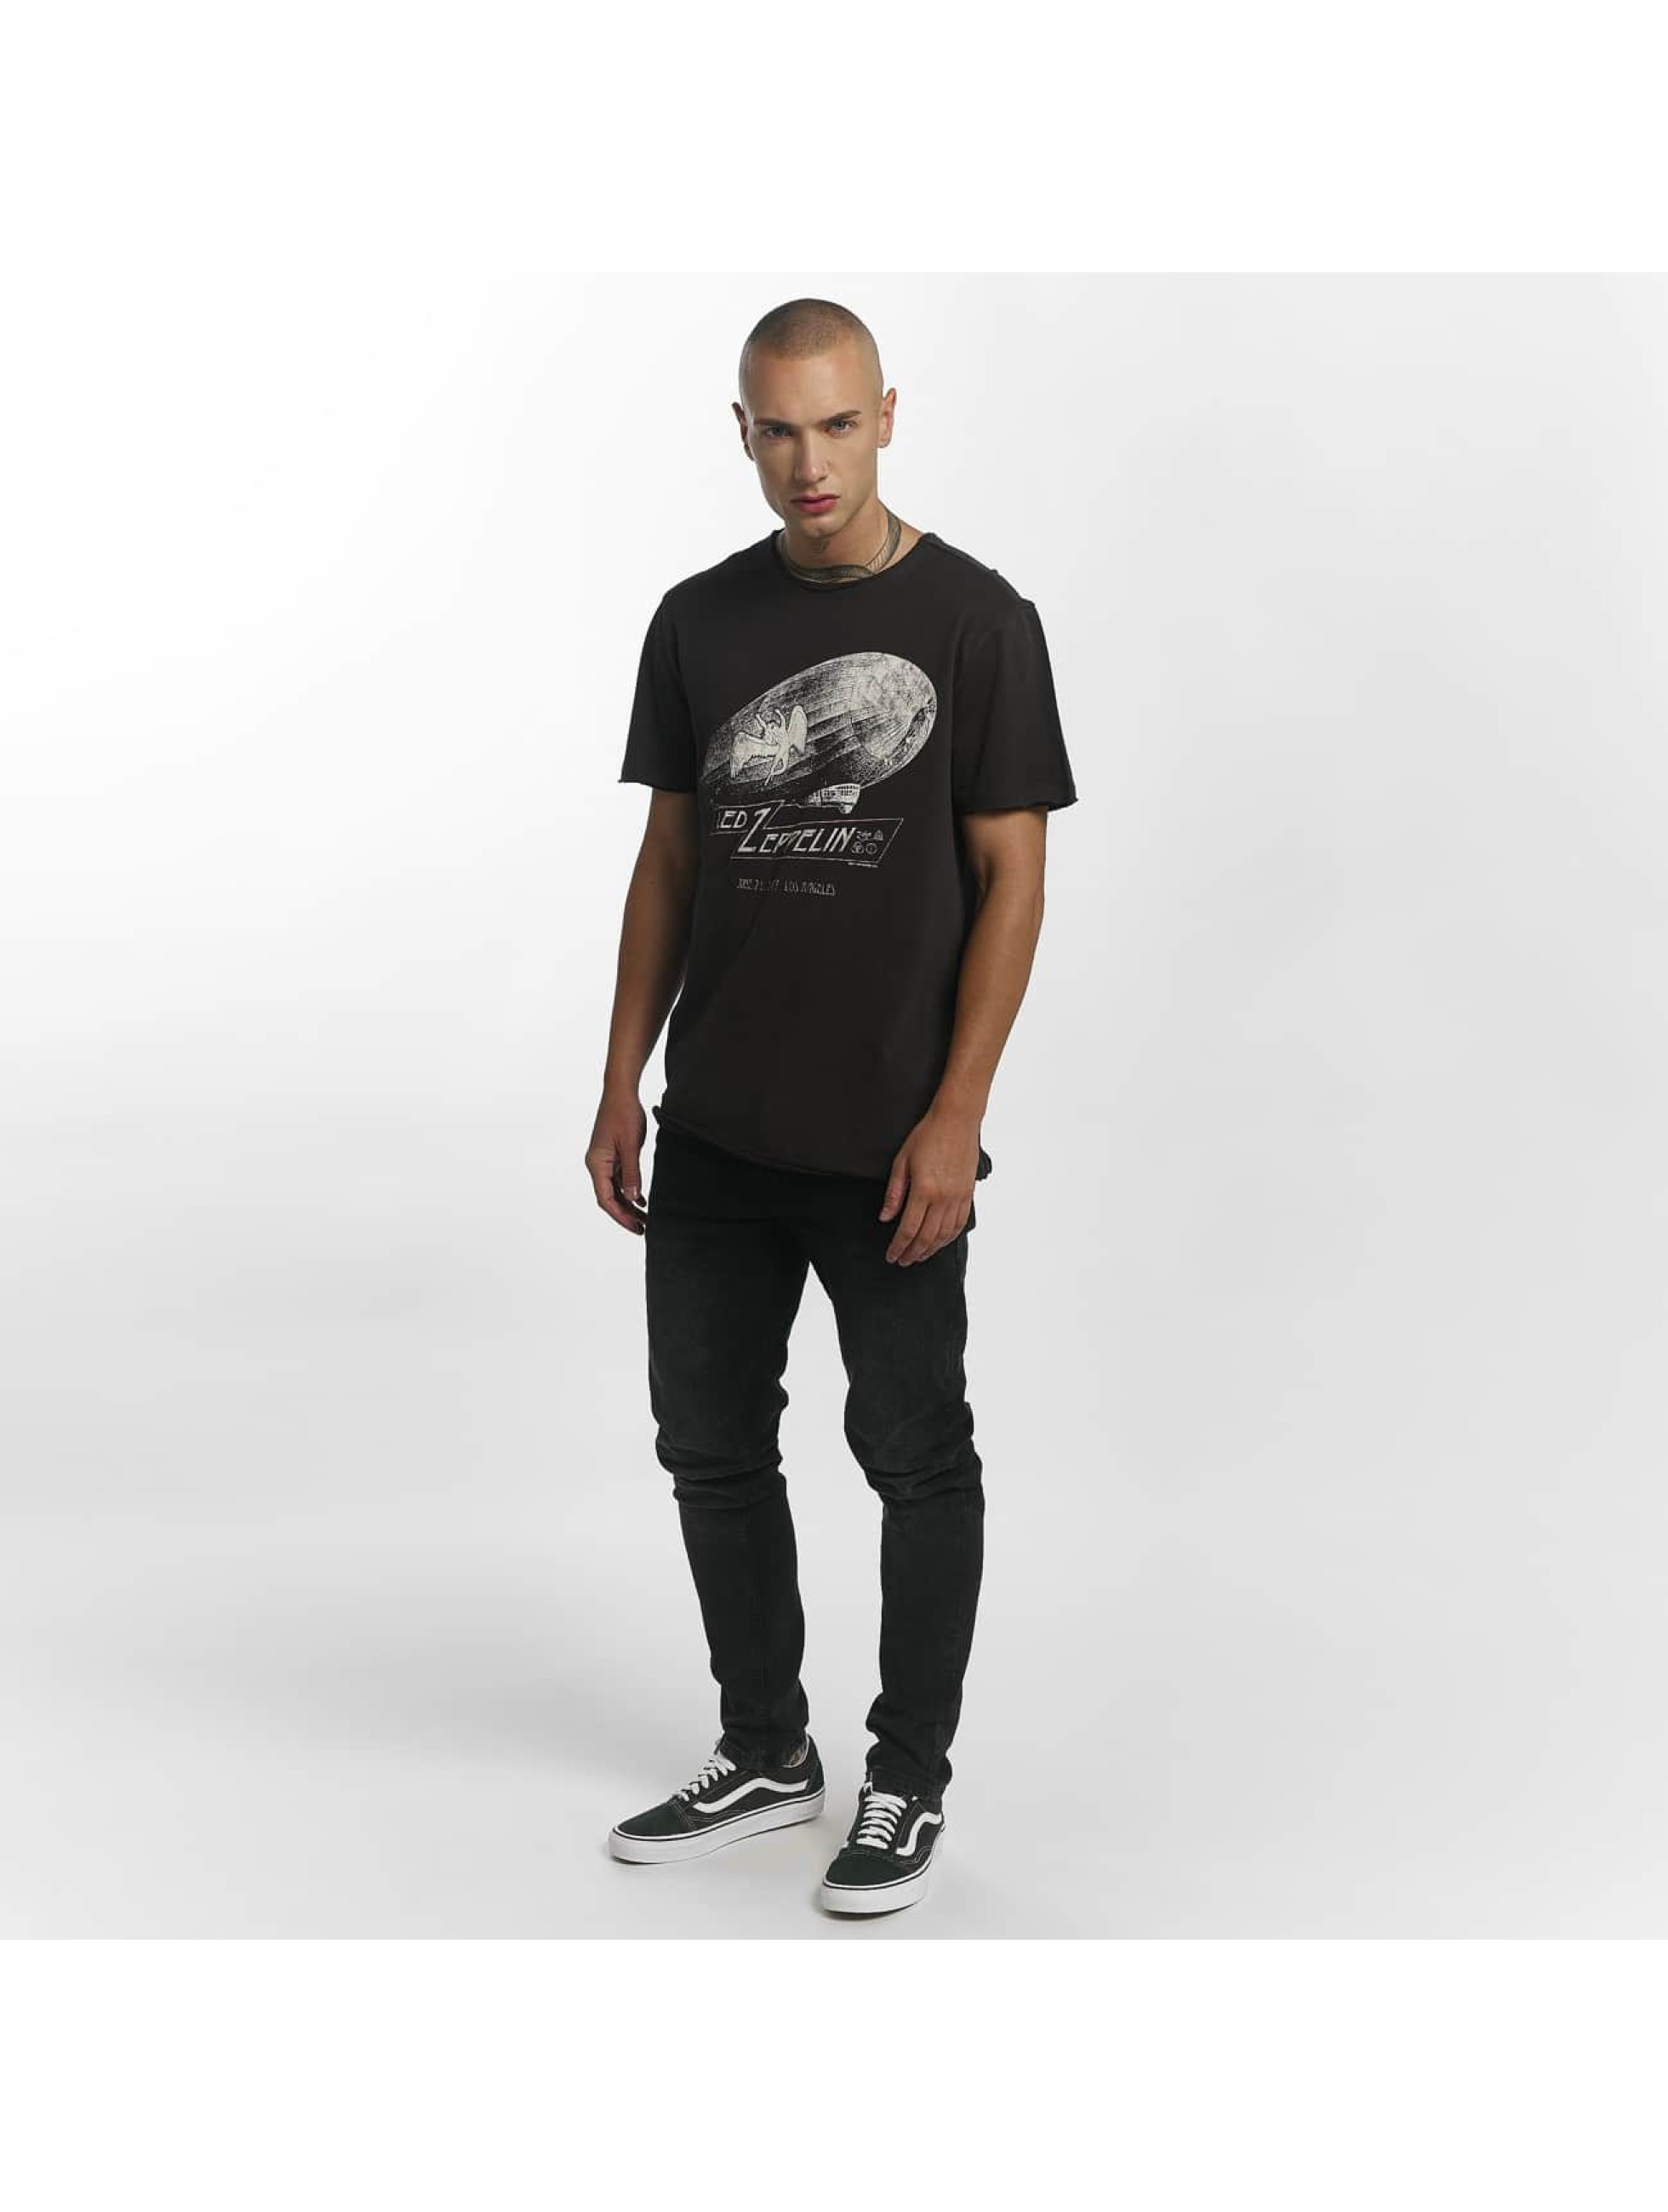 Amplified T-Shirt Led Zeppelin Dazed 6 Confused gris